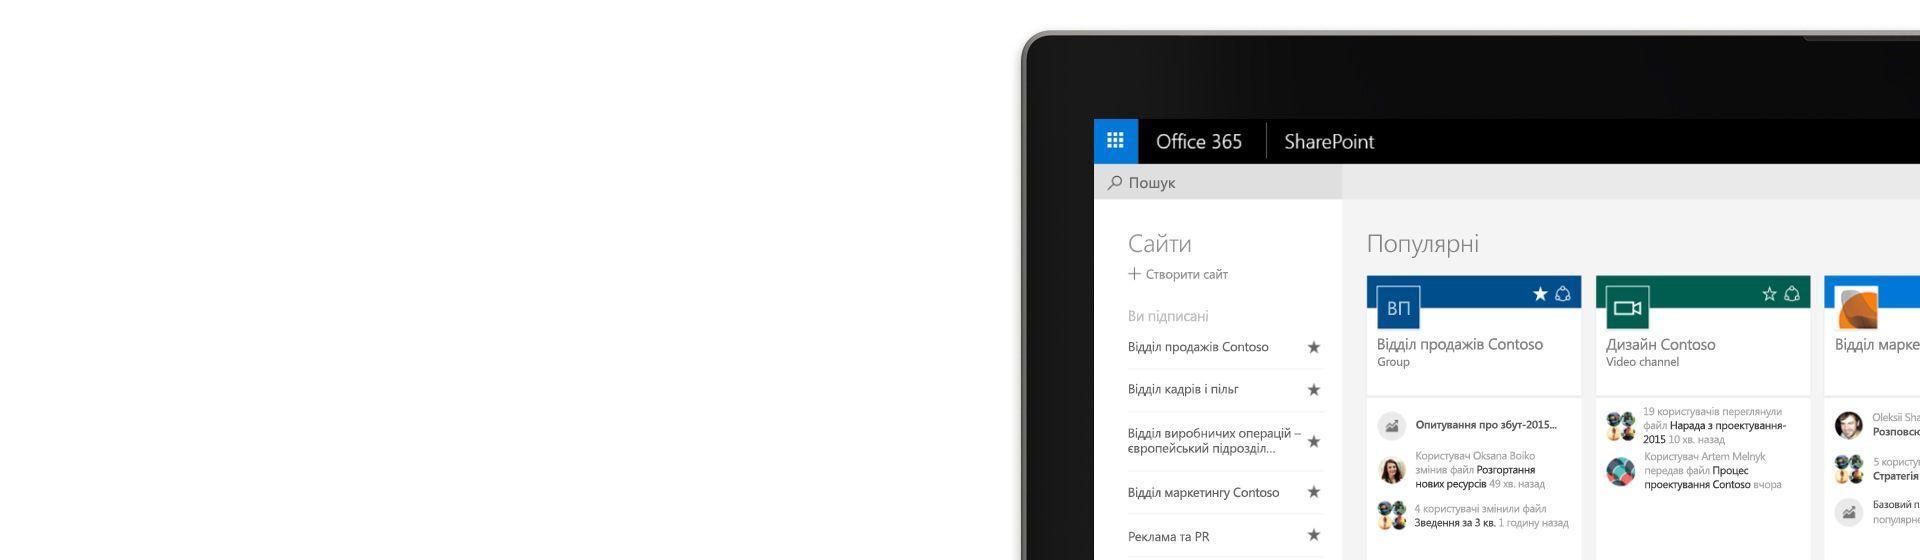 Кут екрана ноутбука, на якому відкрито SharePoint в Office 365 для Contoso